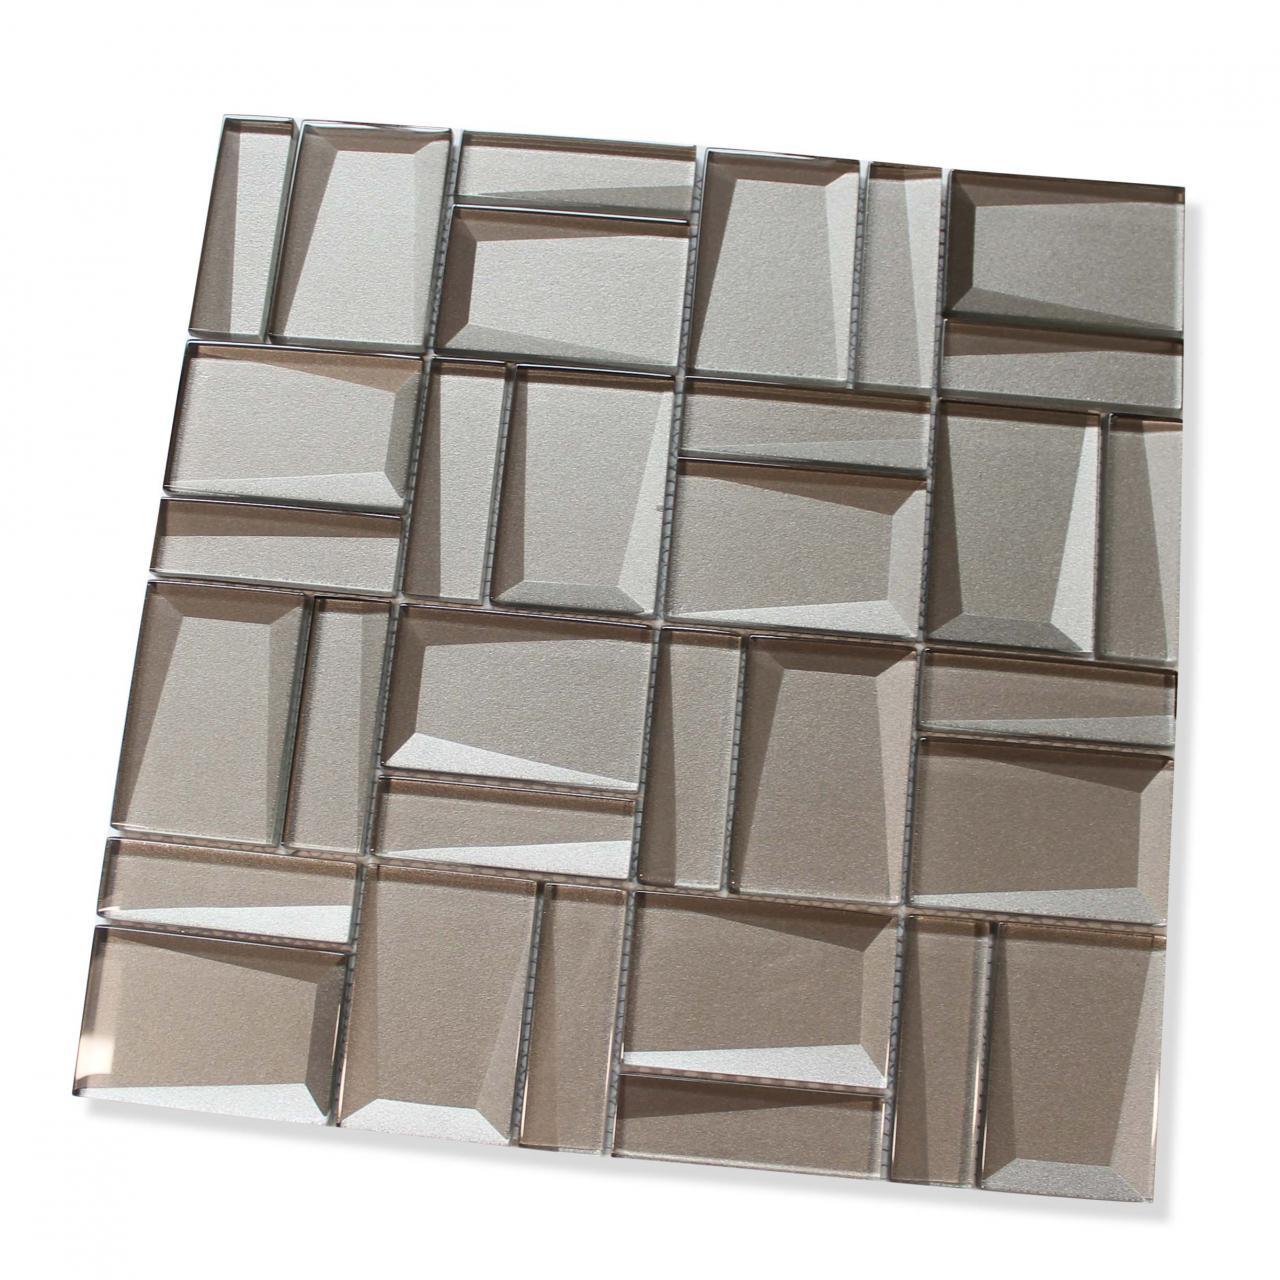 - Illusion II 3D 3x3 Beveled Glass Mosaic Tiles - Morion -Backsplash